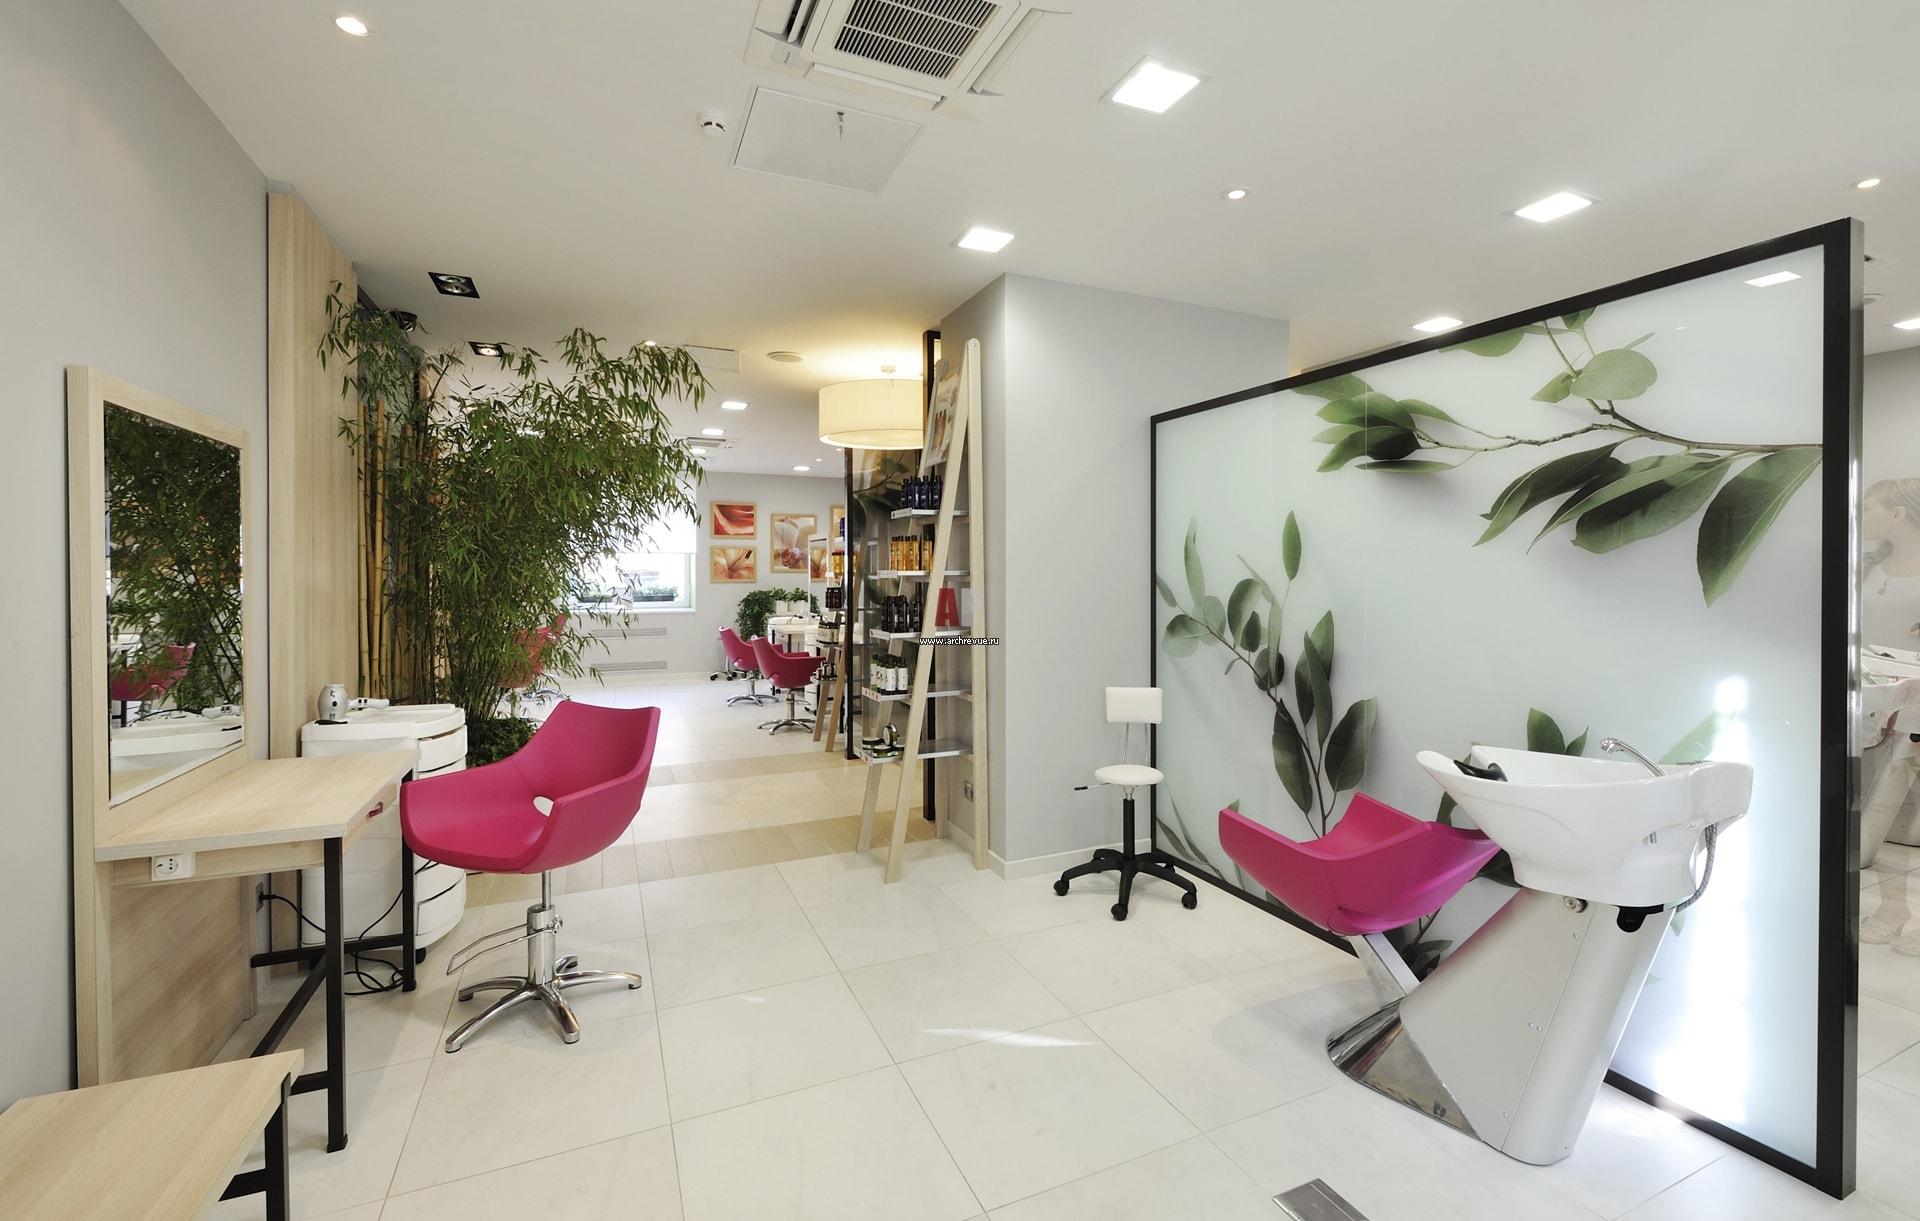 Дизайн салон красоты фото